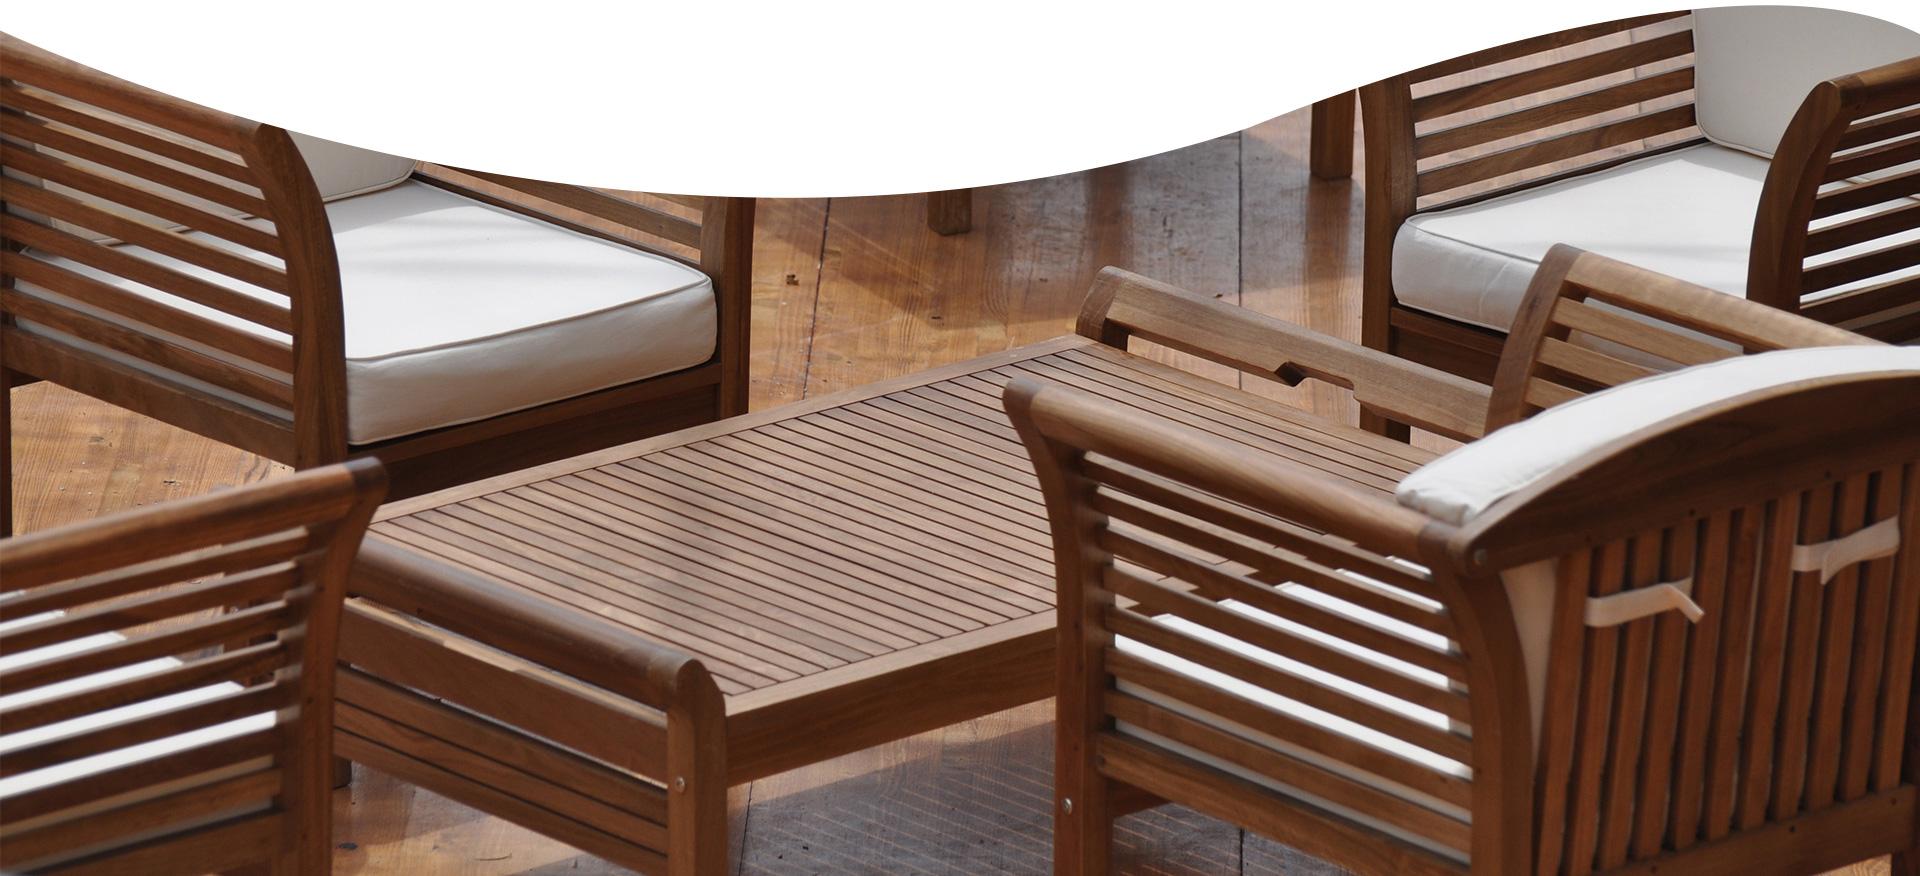 Indonesian teak wood furniture singapore ever x wood for Teak wood furniture